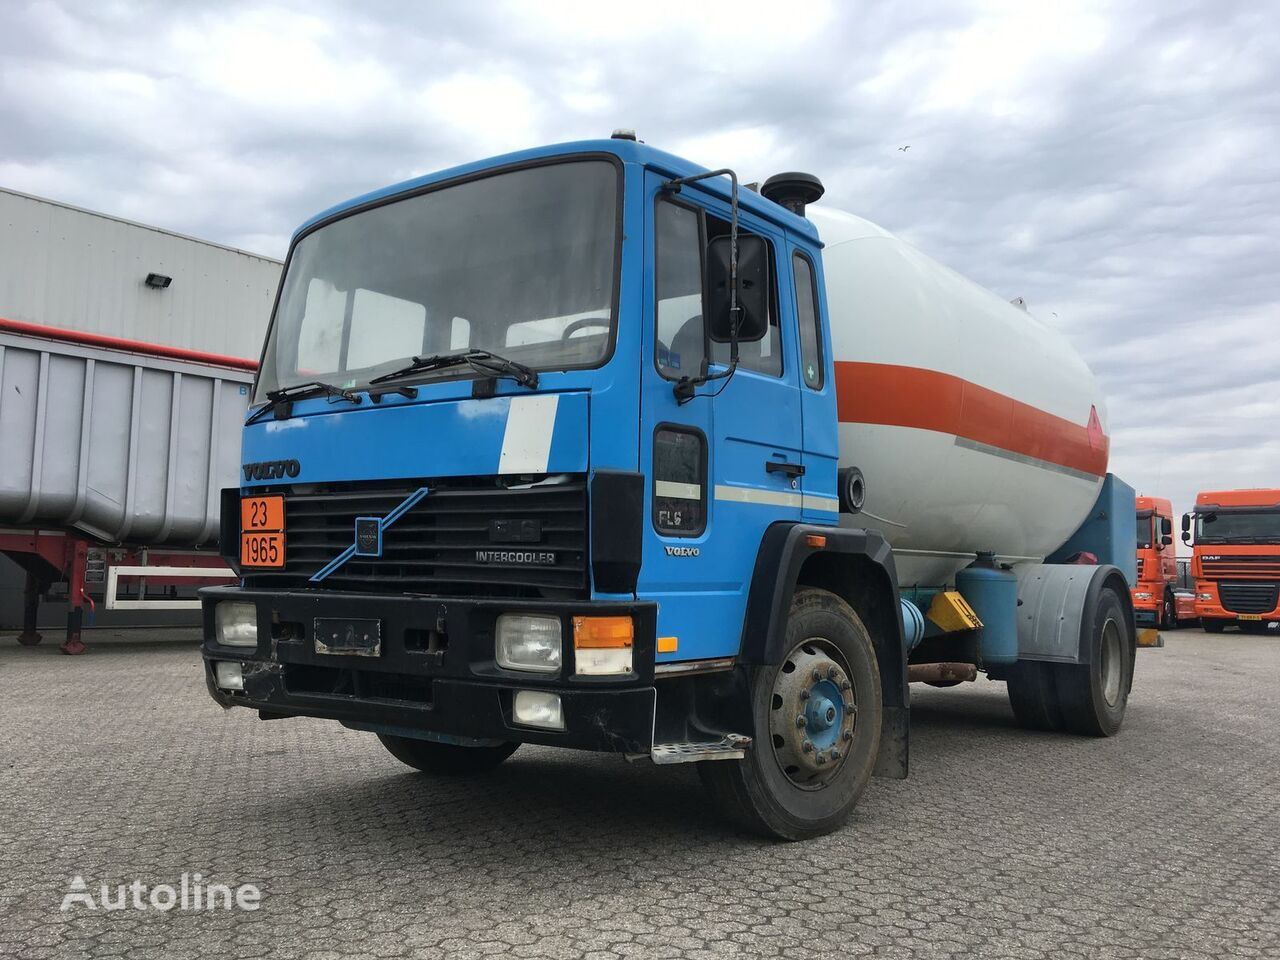 VOLVO Volvo Gas - Gaz - ADR 2 - 16.000ltr - 25Bar - P25BH Gastransporter LKW